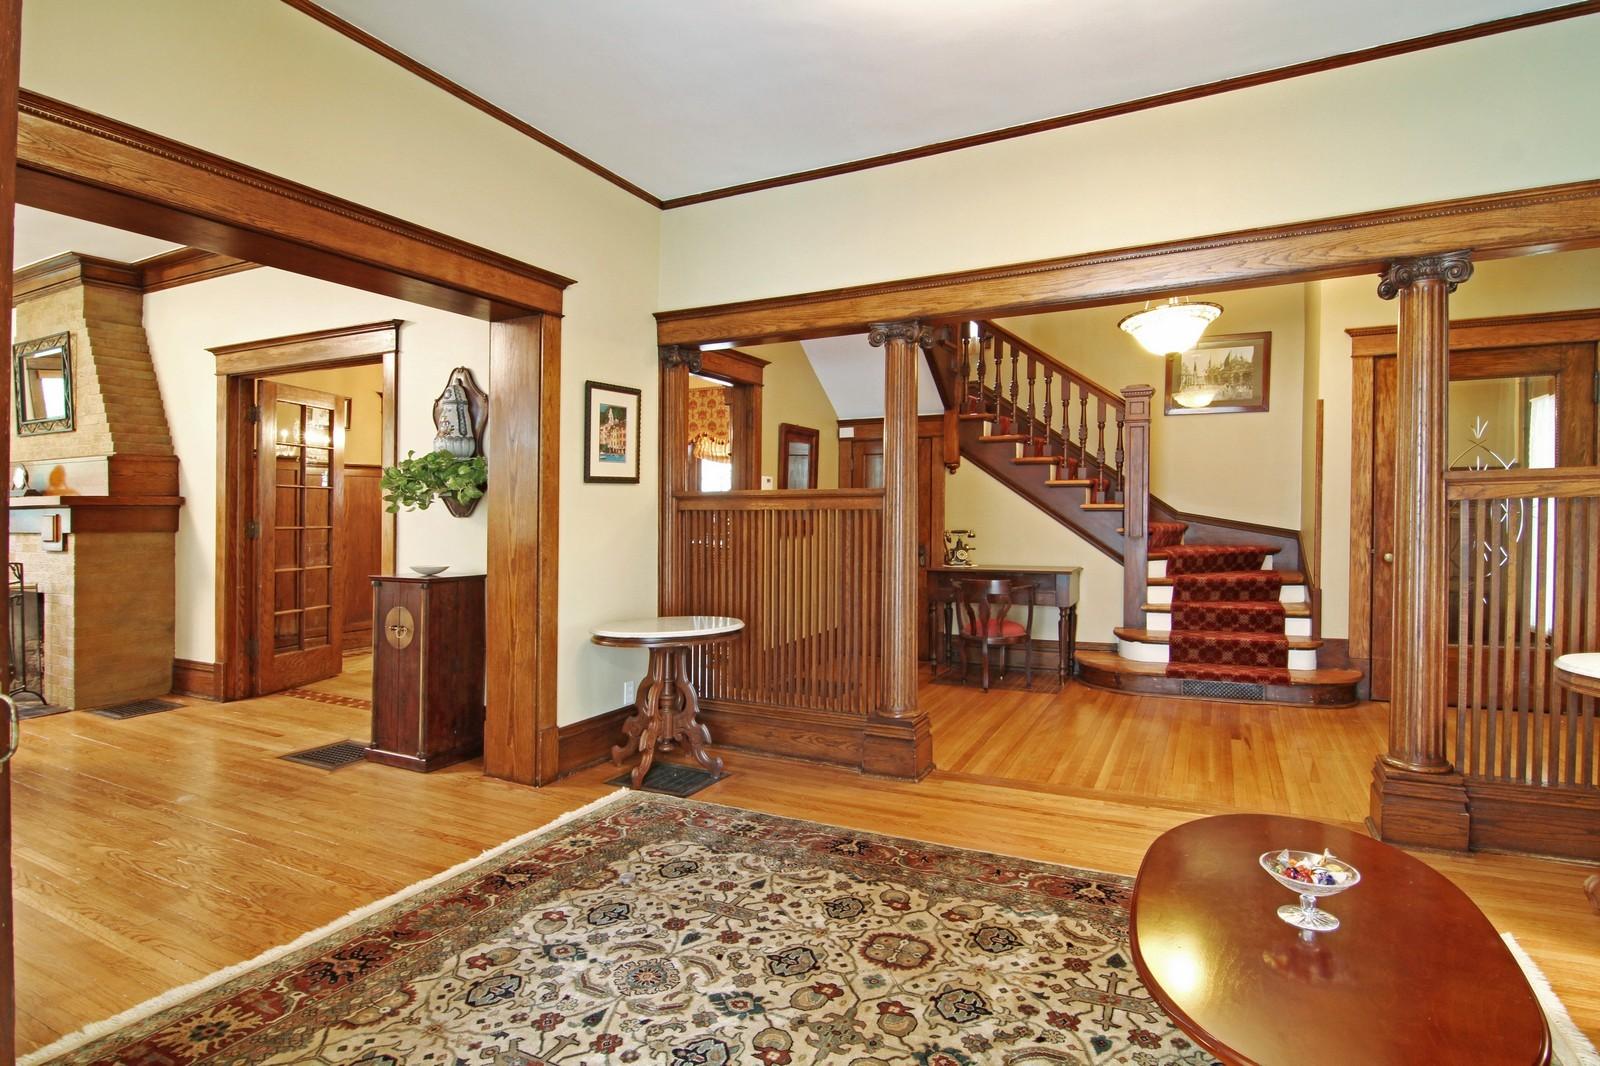 Real Estate Photography - 228 LaGrange Rd, La Grange, IL, 60525 - Living Rm/Family Rm